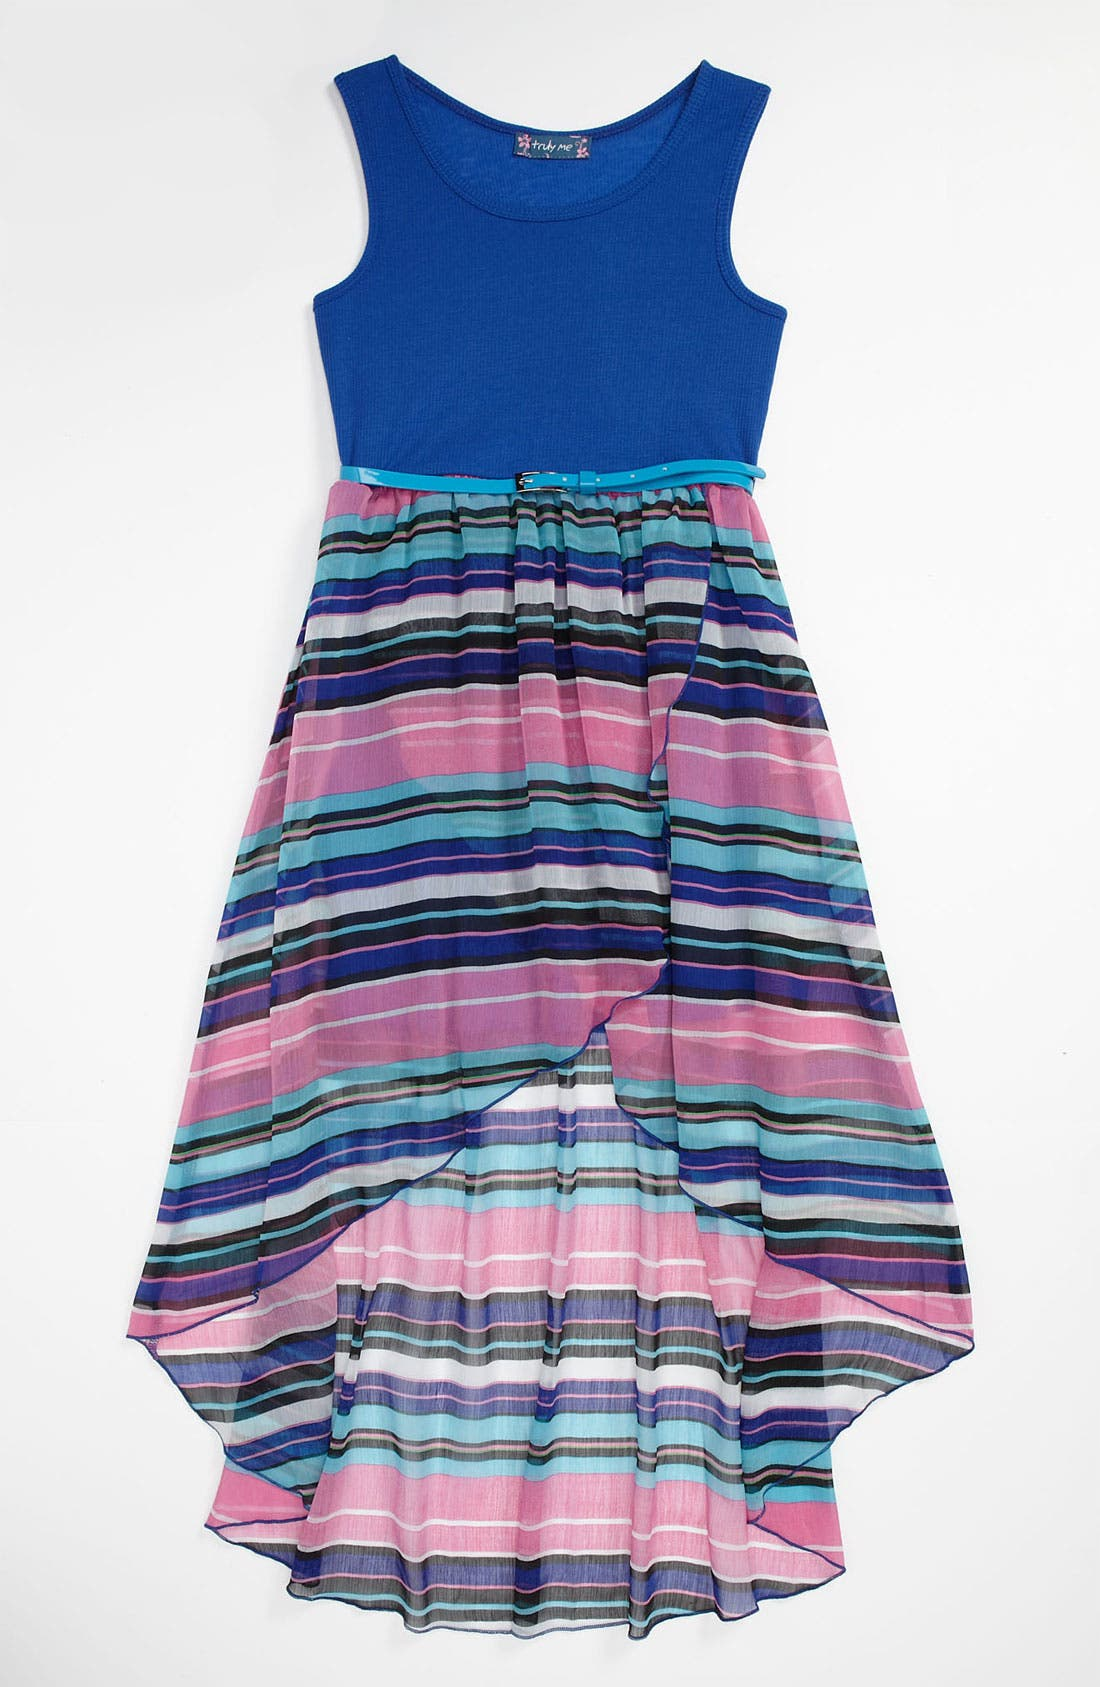 Alternate Image 1 Selected - Truly Me Sleeveless Dress (Big Girls)